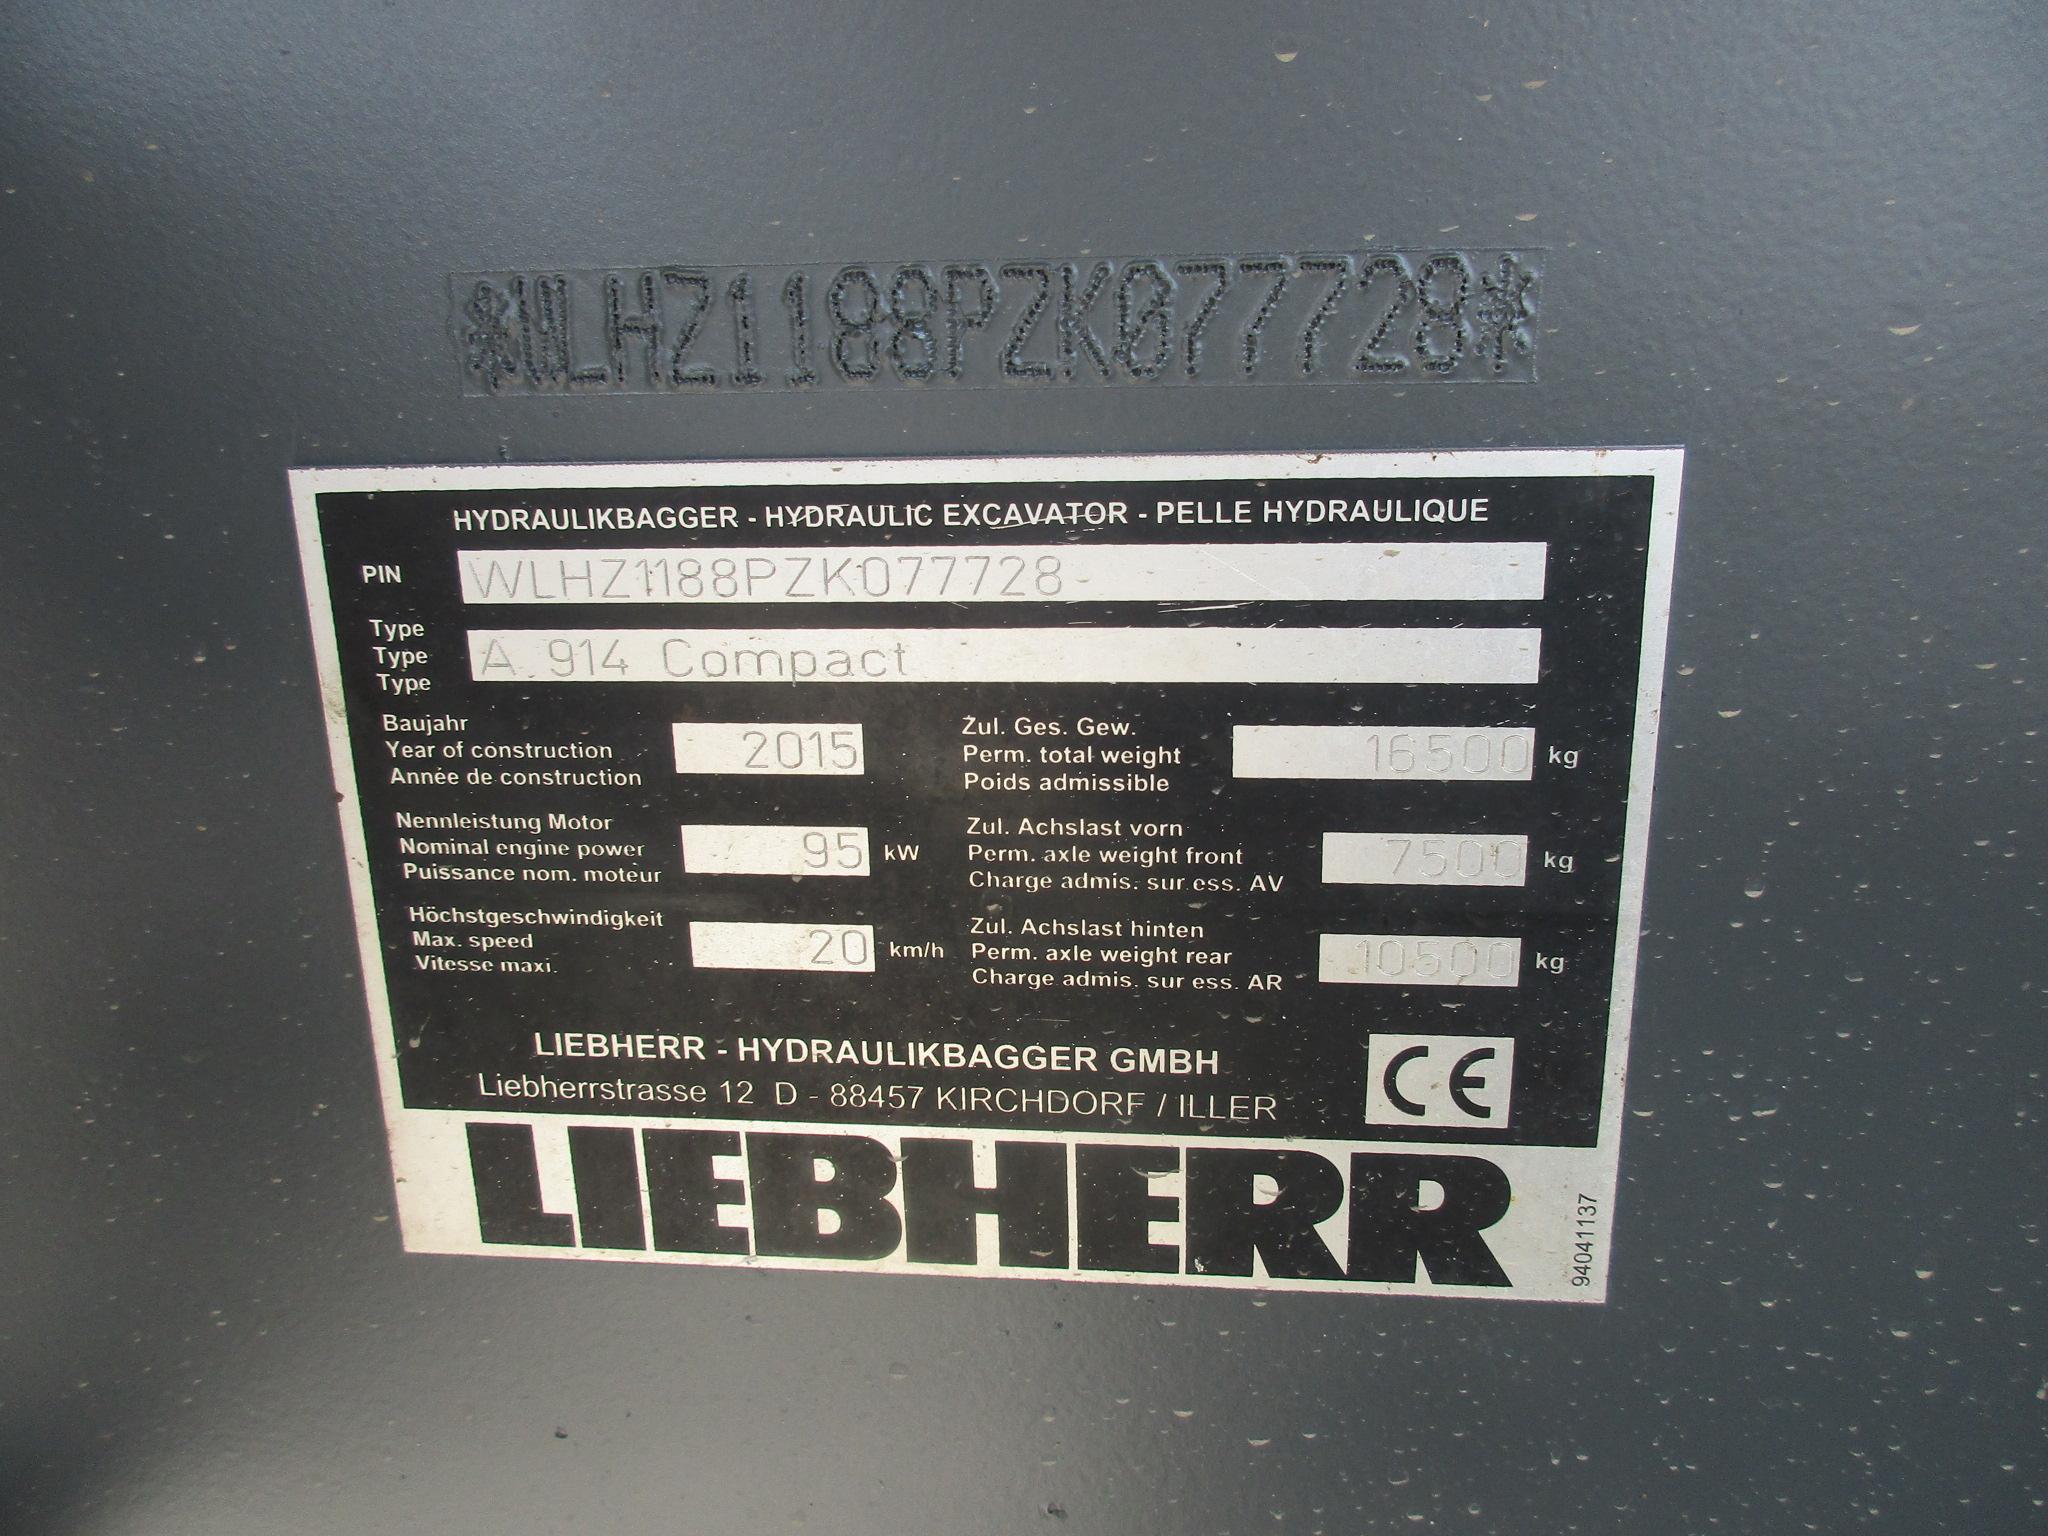 A914 Compact LI-1188-77728 - ex LMP_009.JPG